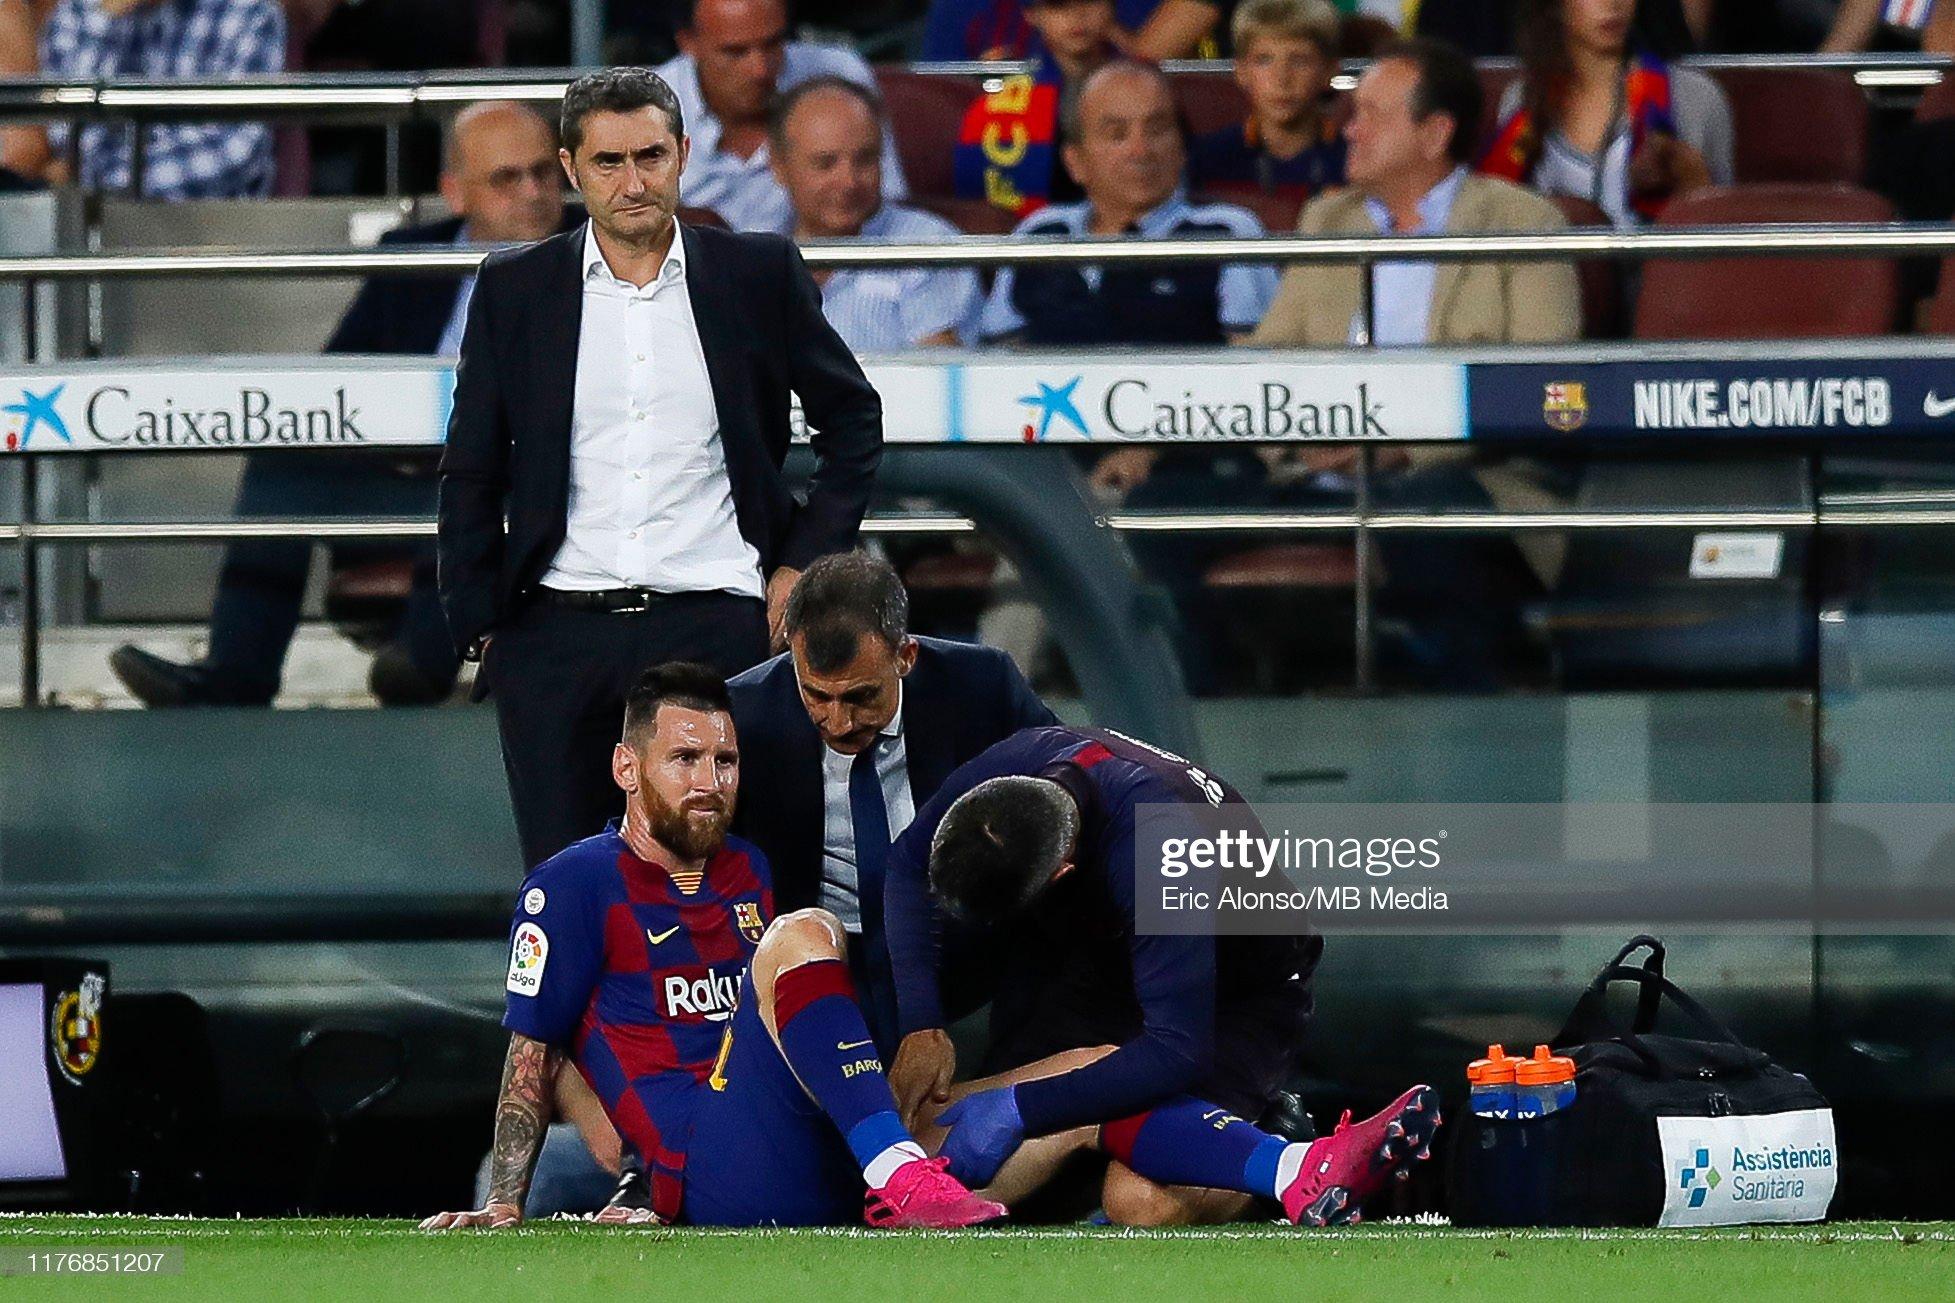 صور مباراة : برشلونة - فياريال 2-1 ( 24-09-2019 )  Lionel-messi-of-fc-barcelona-on-the-floor-after-injury-during-the-picture-id1176851207?s=2048x2048